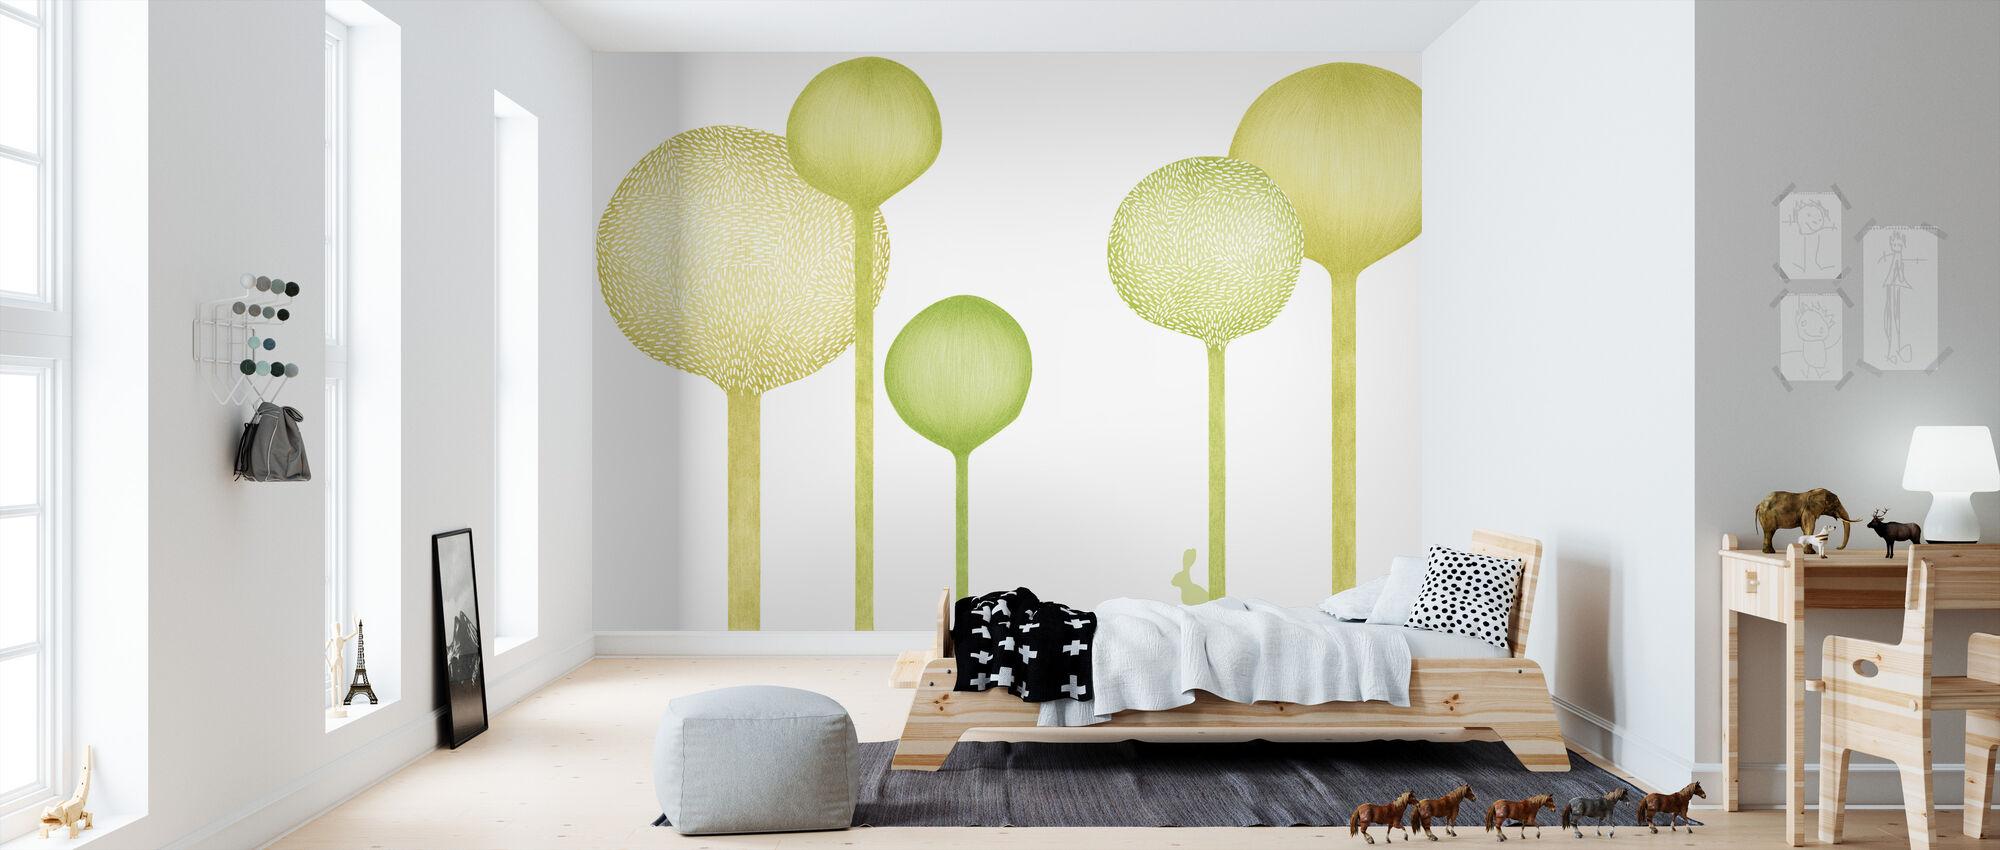 Studio Rita | Elin Öhrling - Forestscape - Green - Wallpaper - Kids Room